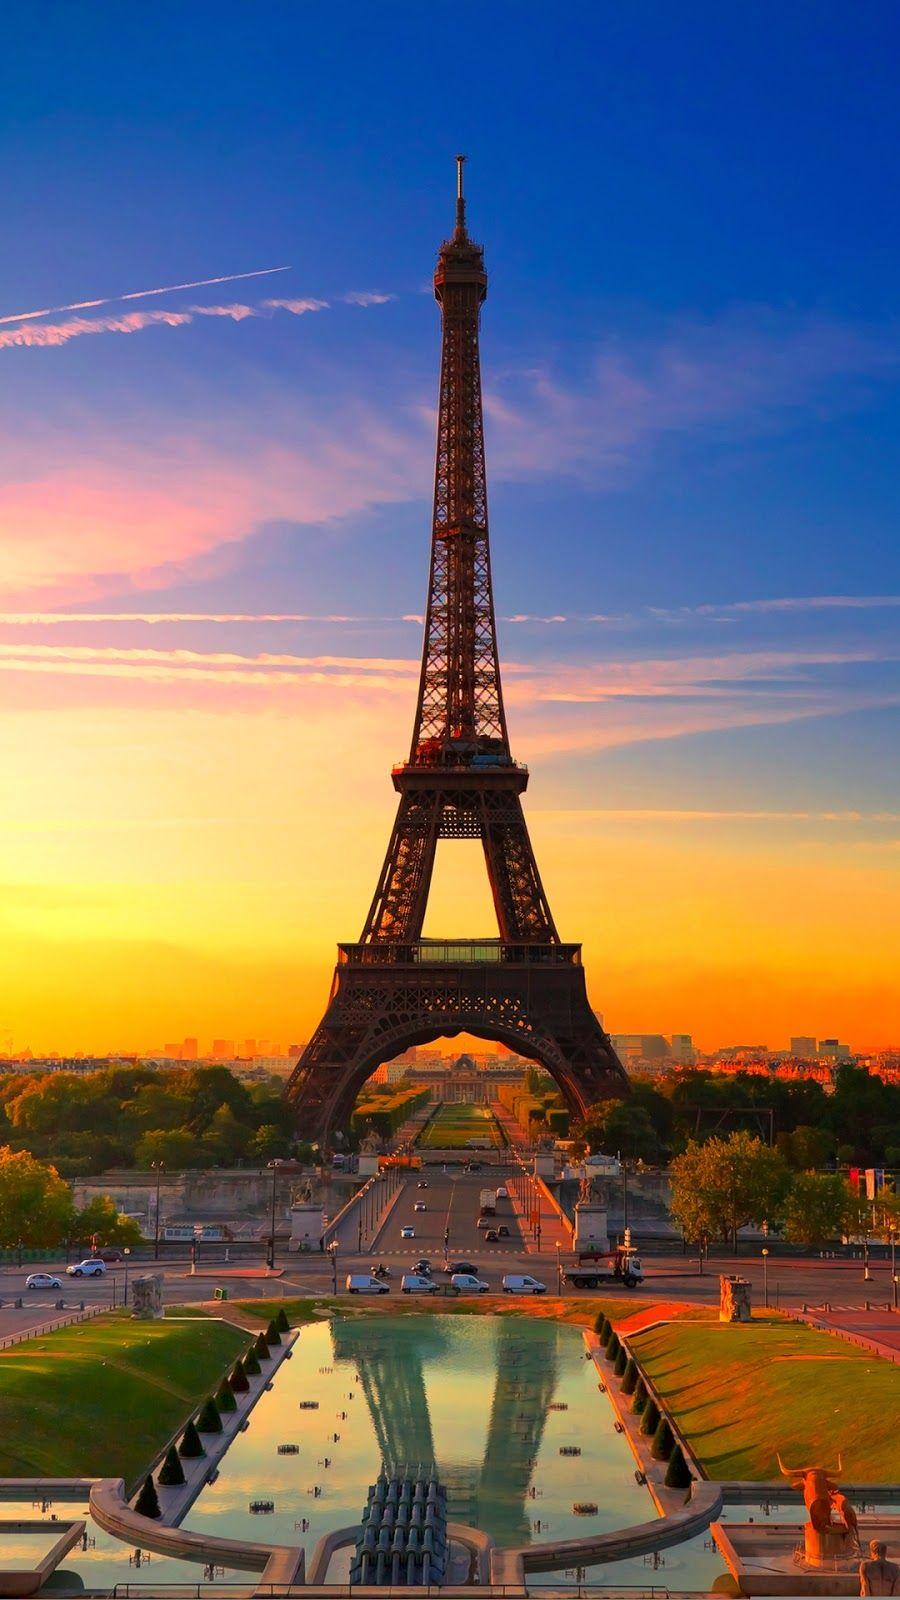 25 Hd Retina Wallpaper Collection Of Iphone 6 Plus France Eiffel Tower Paris Eiffel Tower